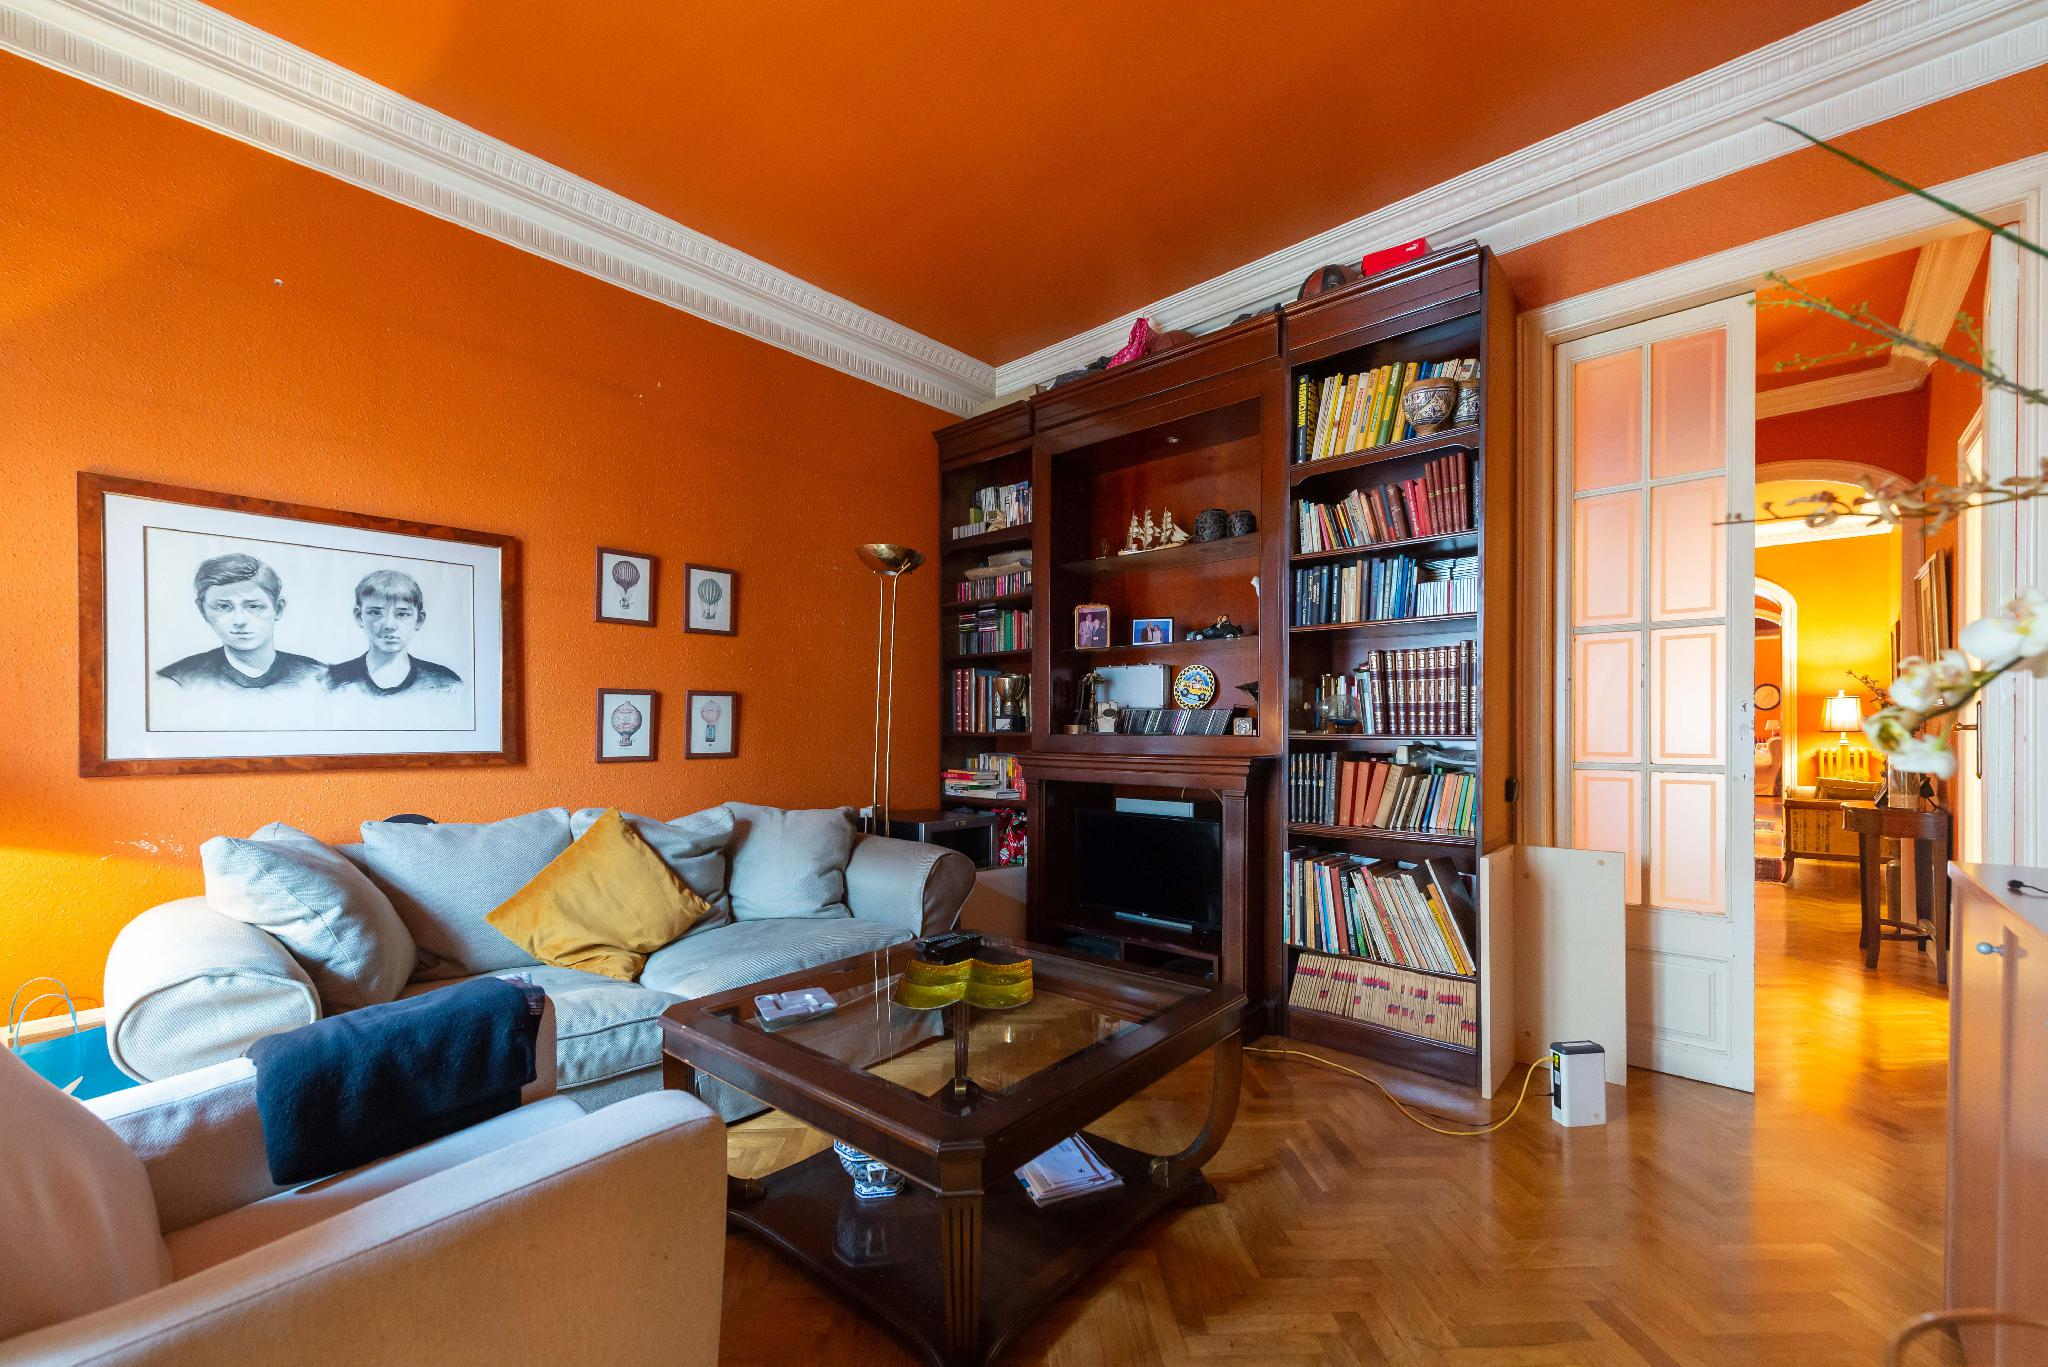 166582 Flat for sale in Eixample, Dreta Eixample 21